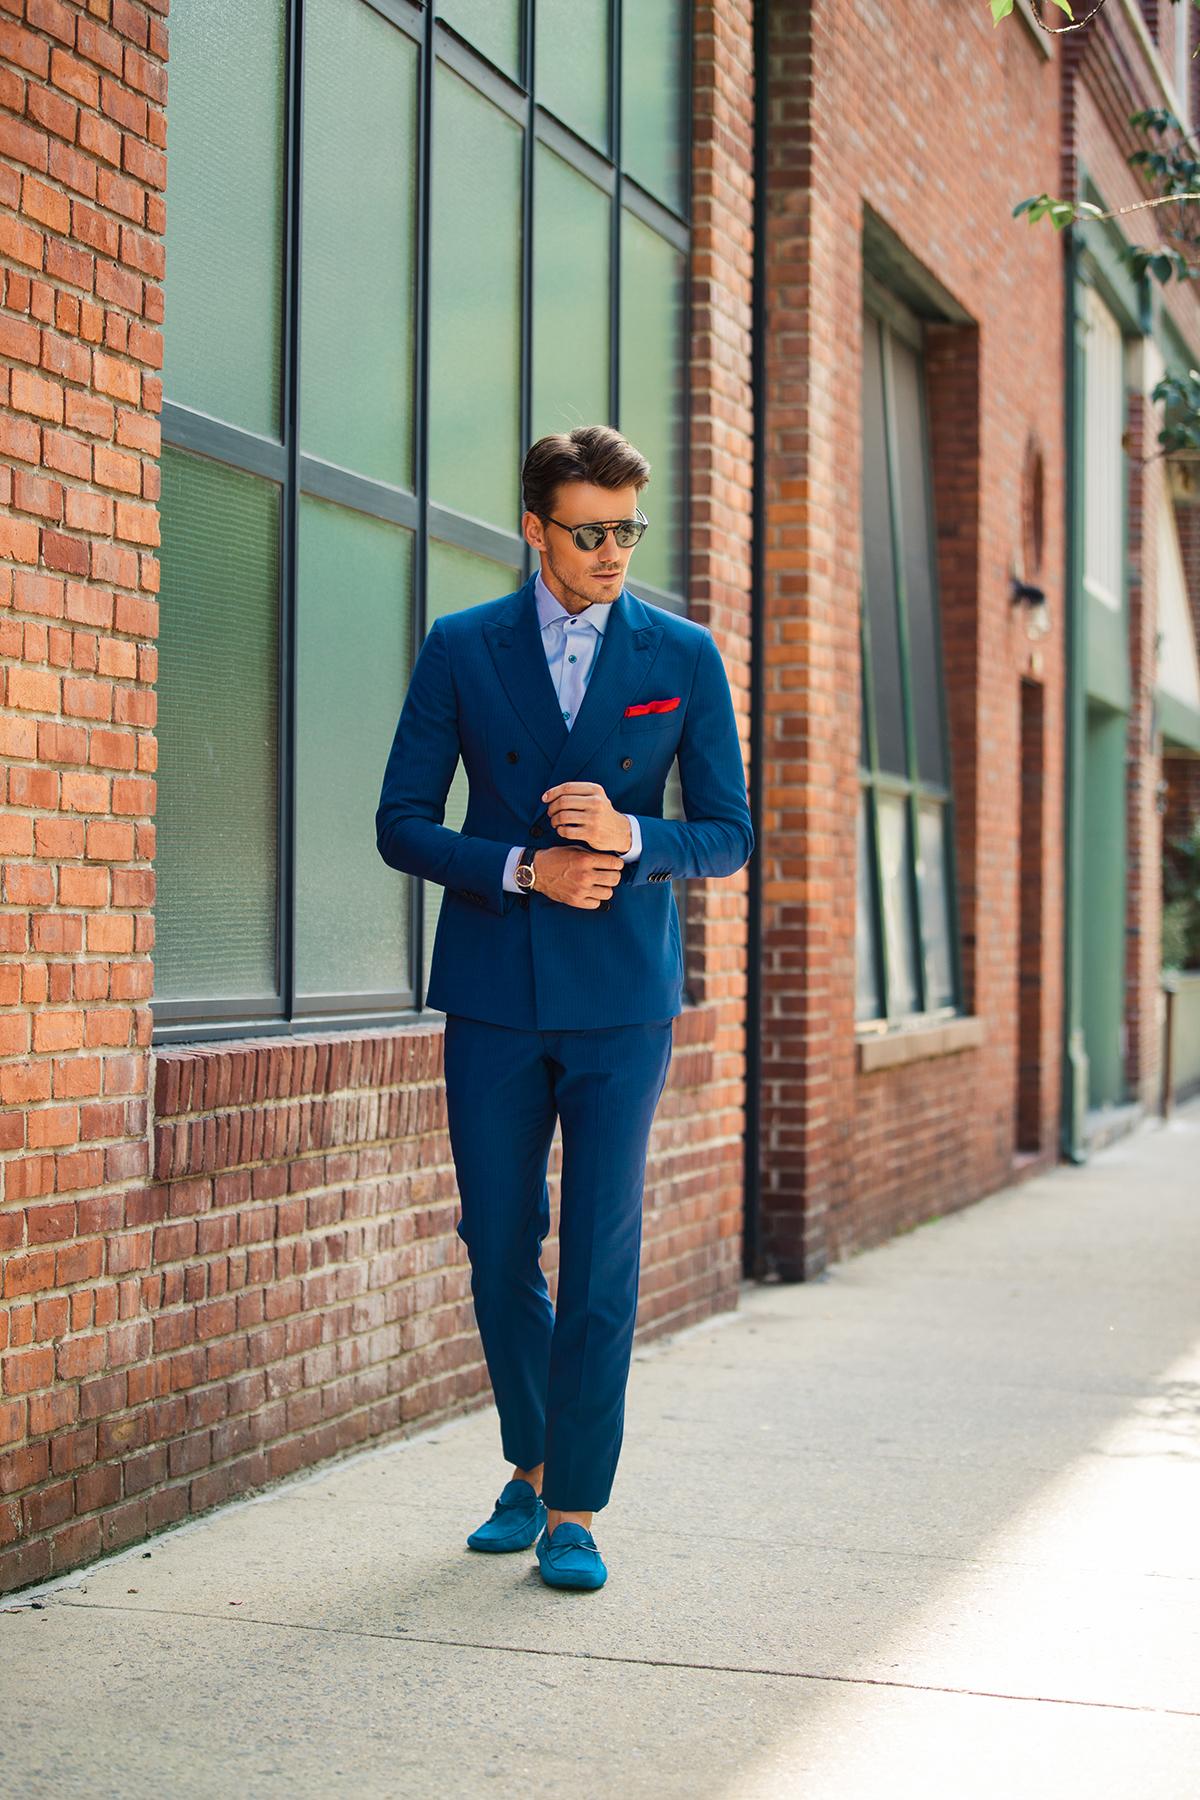 stephenf_ss16_suit